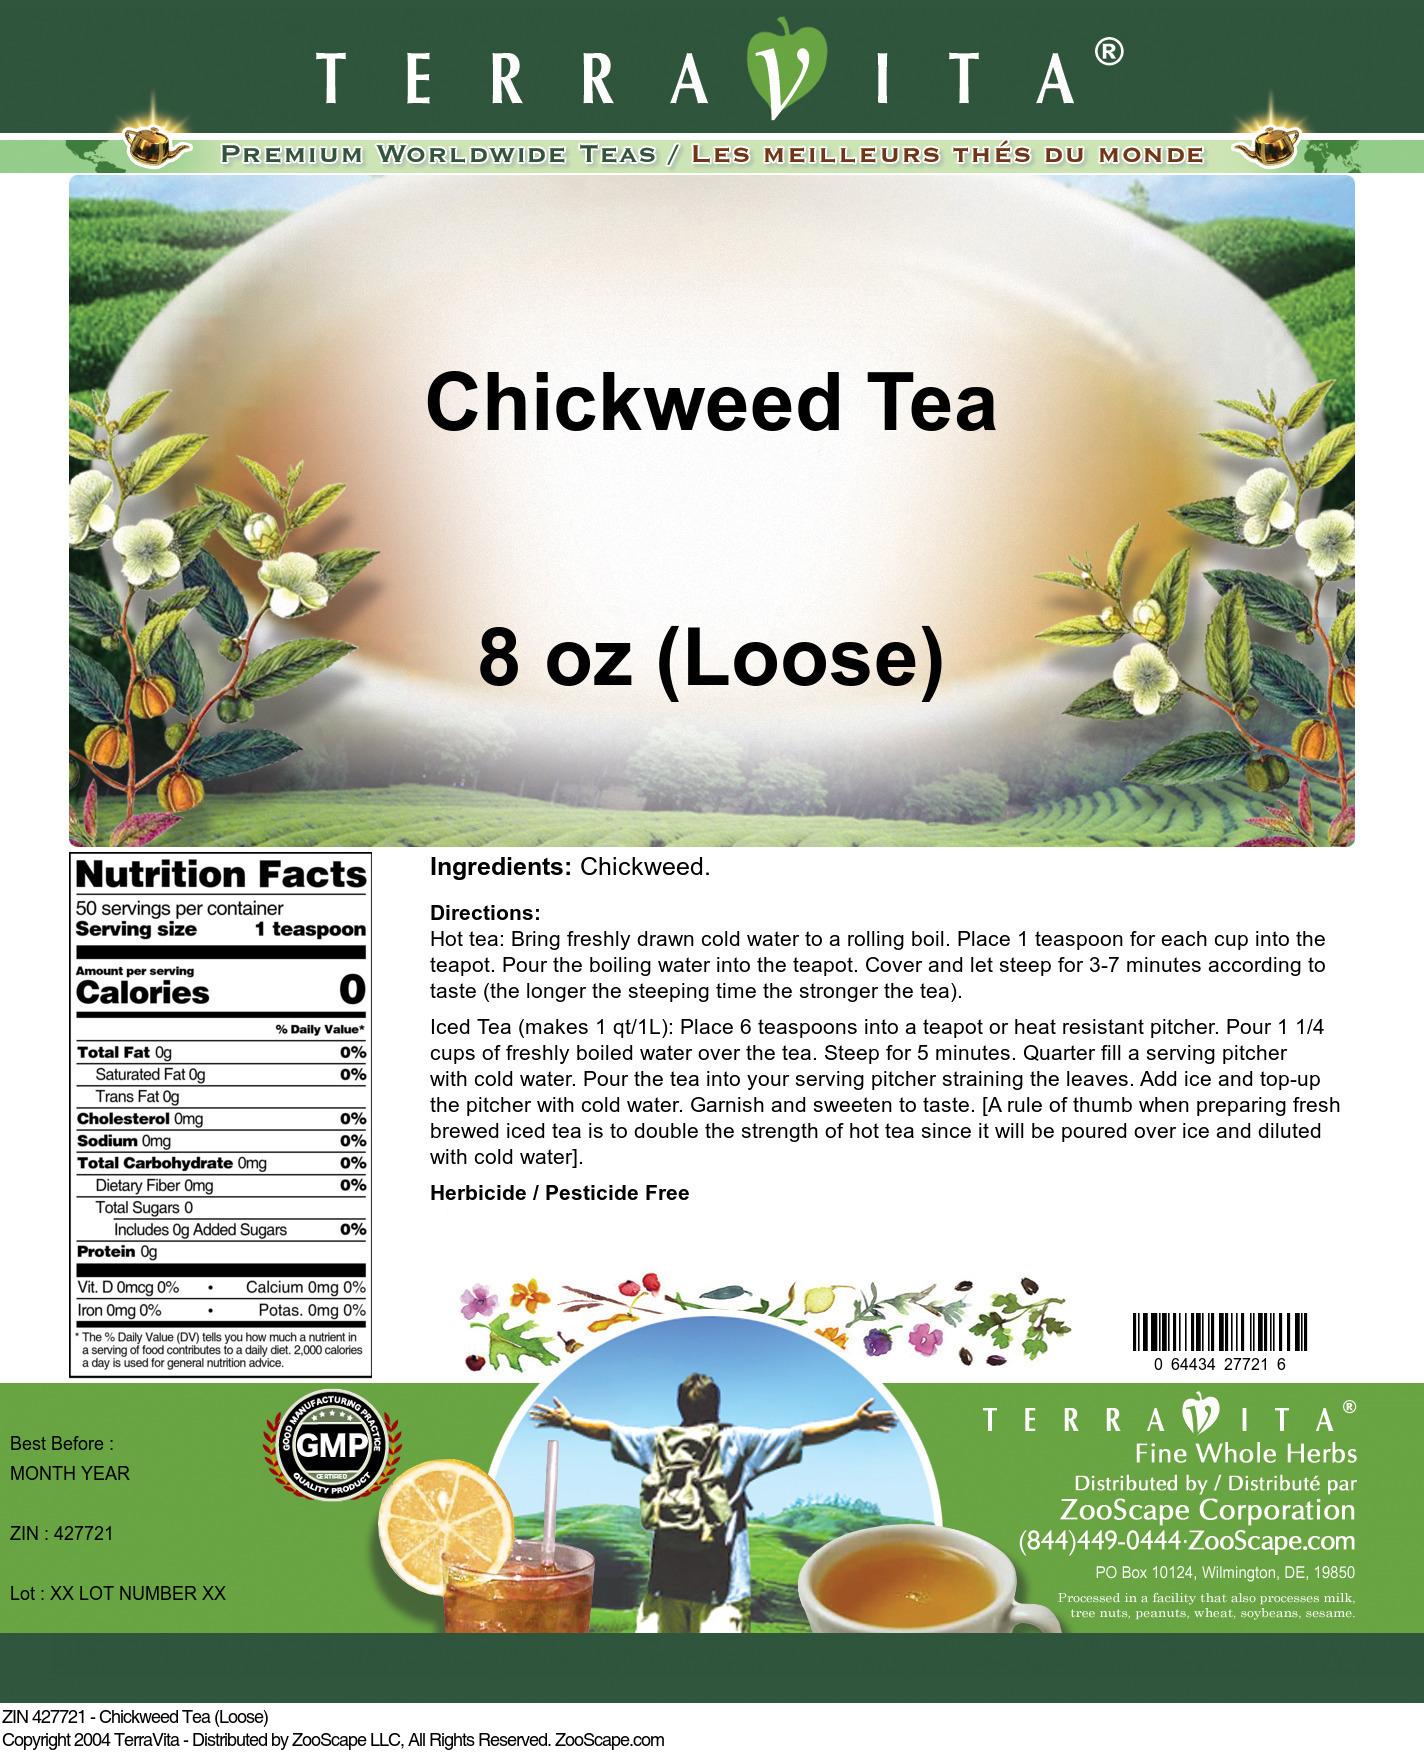 Chickweed Tea (Loose)